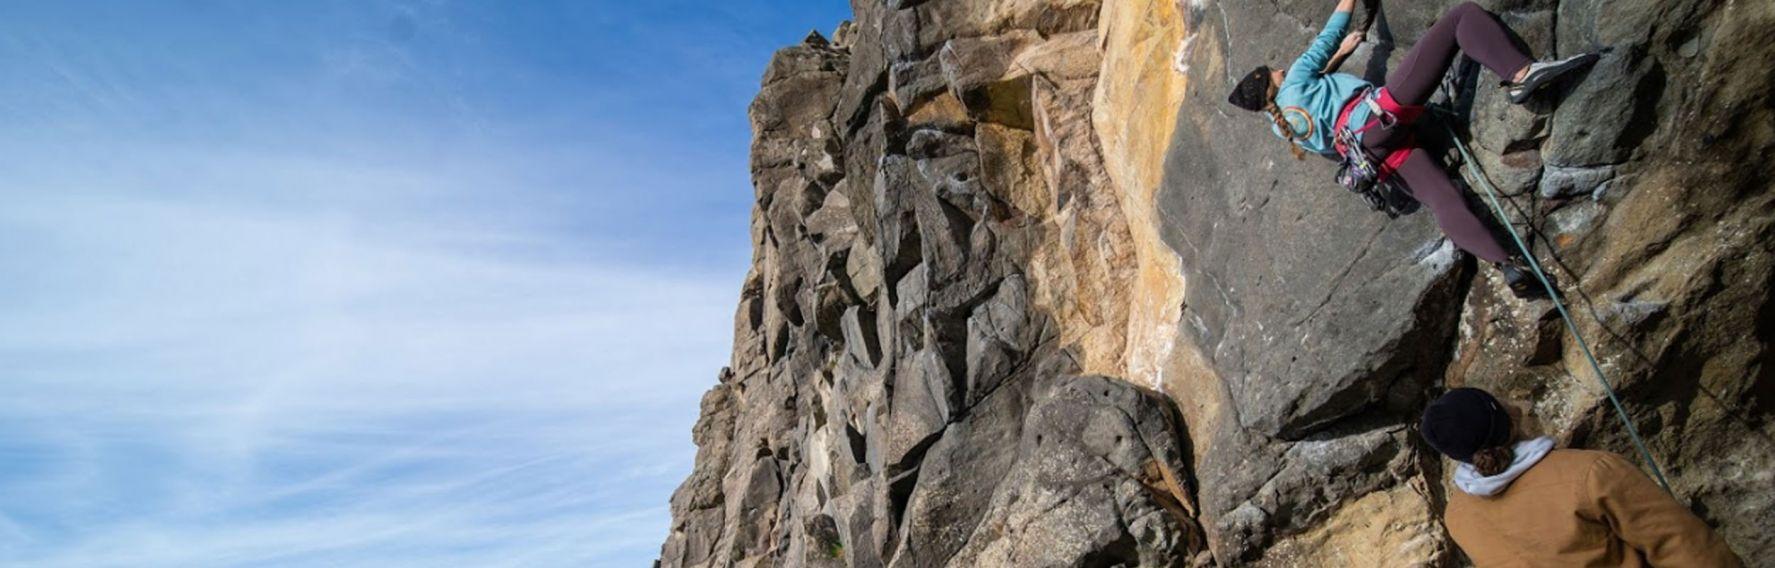 Rock climbing at Long Beach